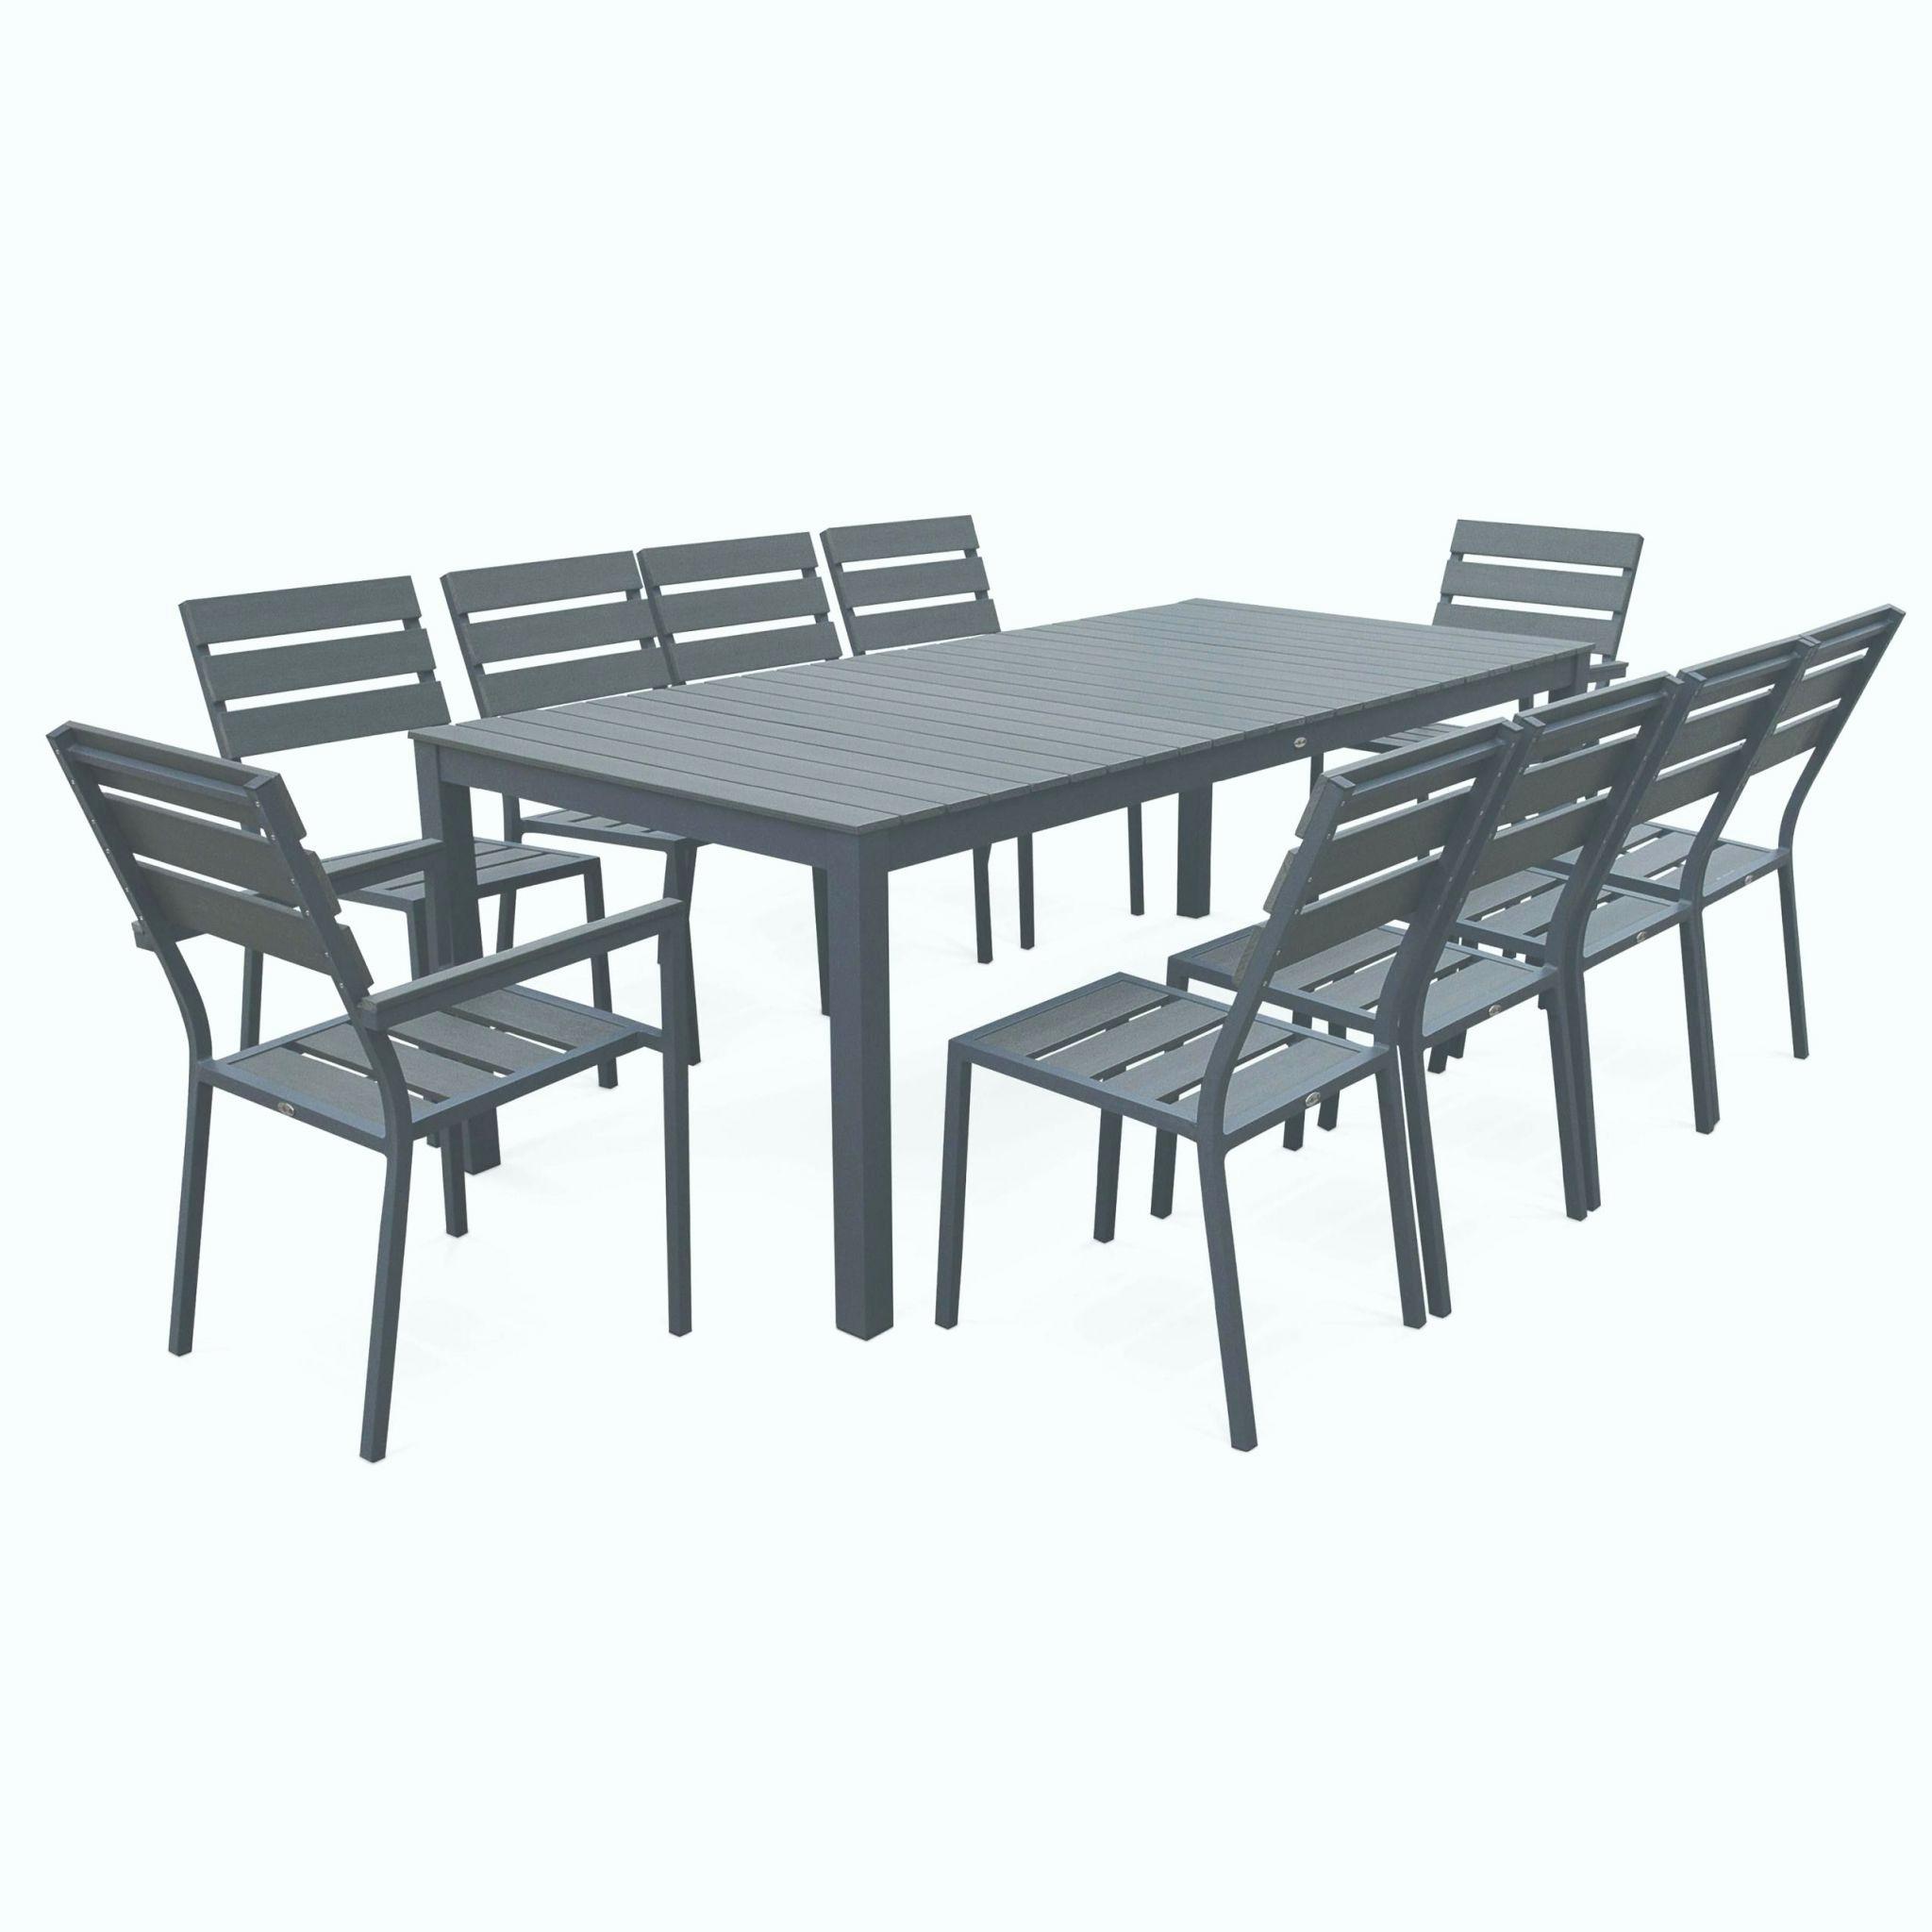 table banc bois elegant jardin mobilier exterieur et table banc jardin luxe banc jardin bois of table banc bois